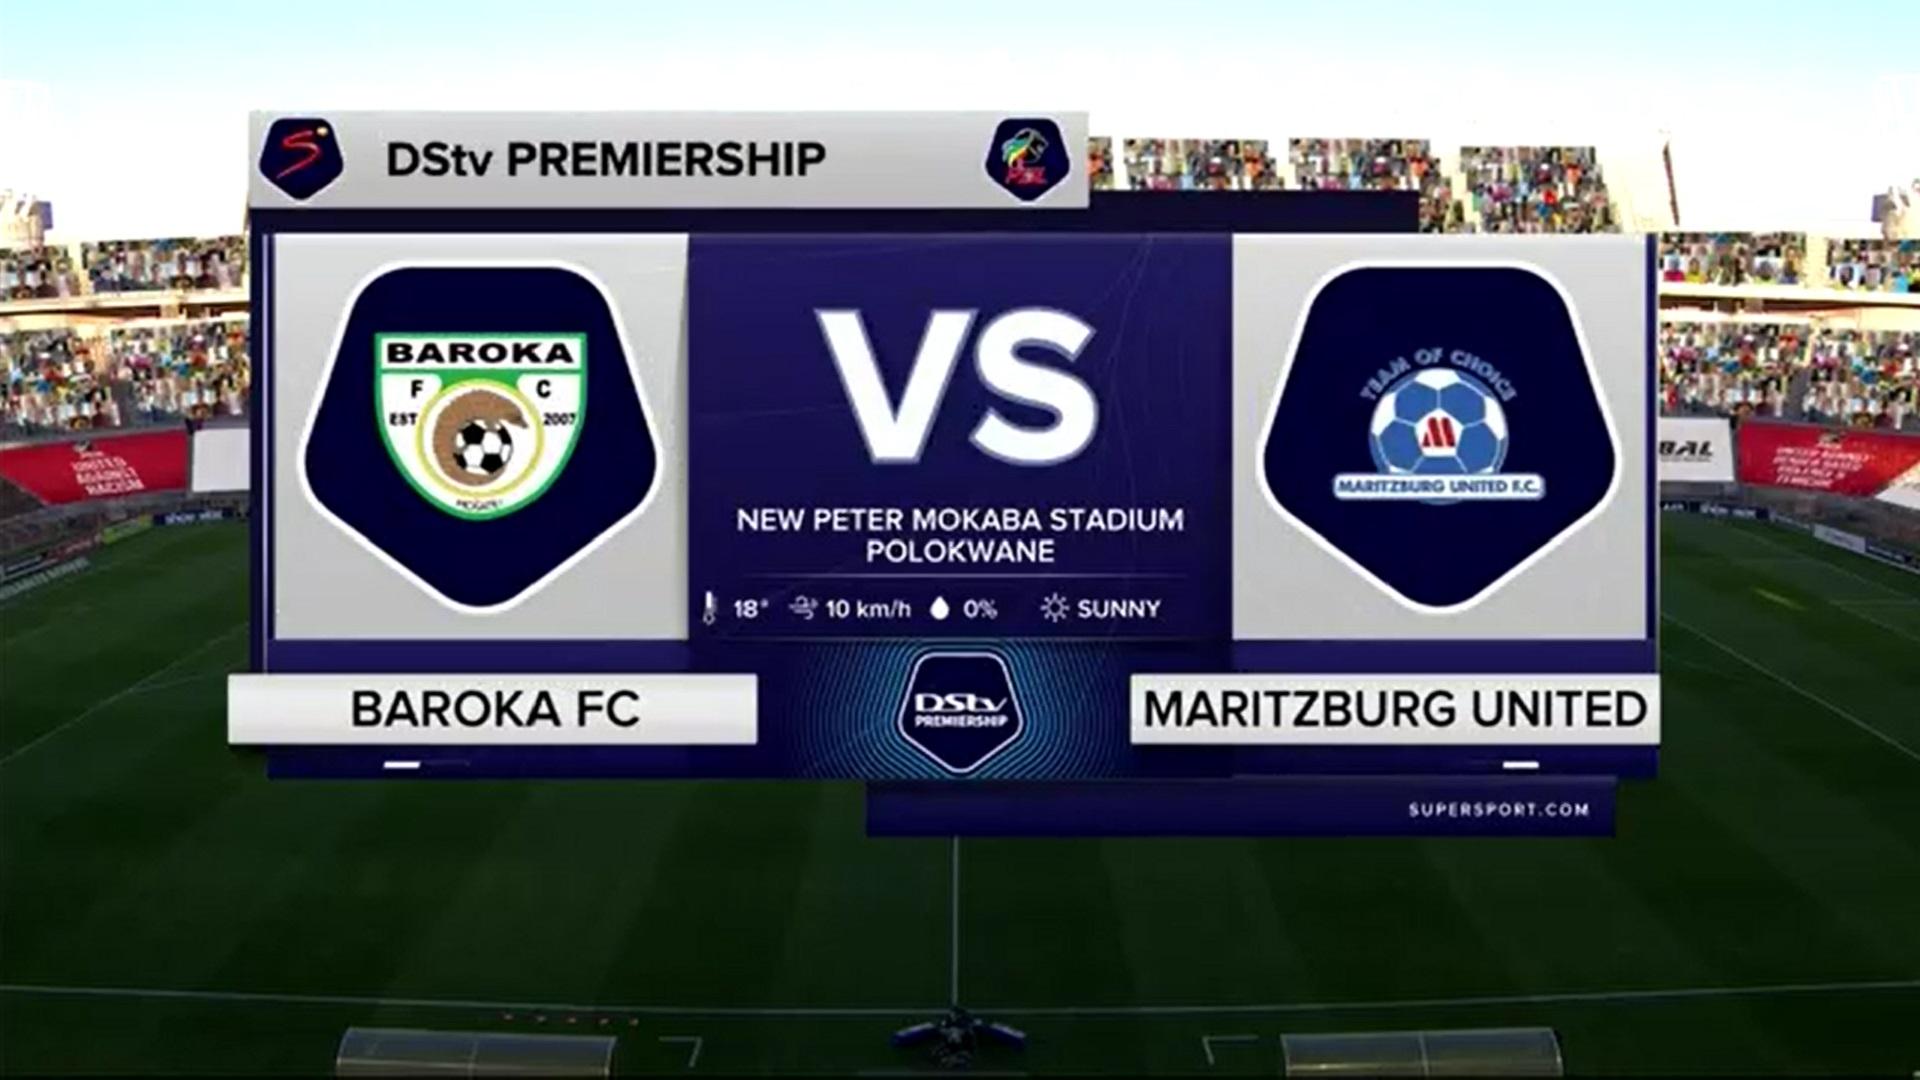 DStv Premiership |  Baroka FC v Maritzburg United | Highlights